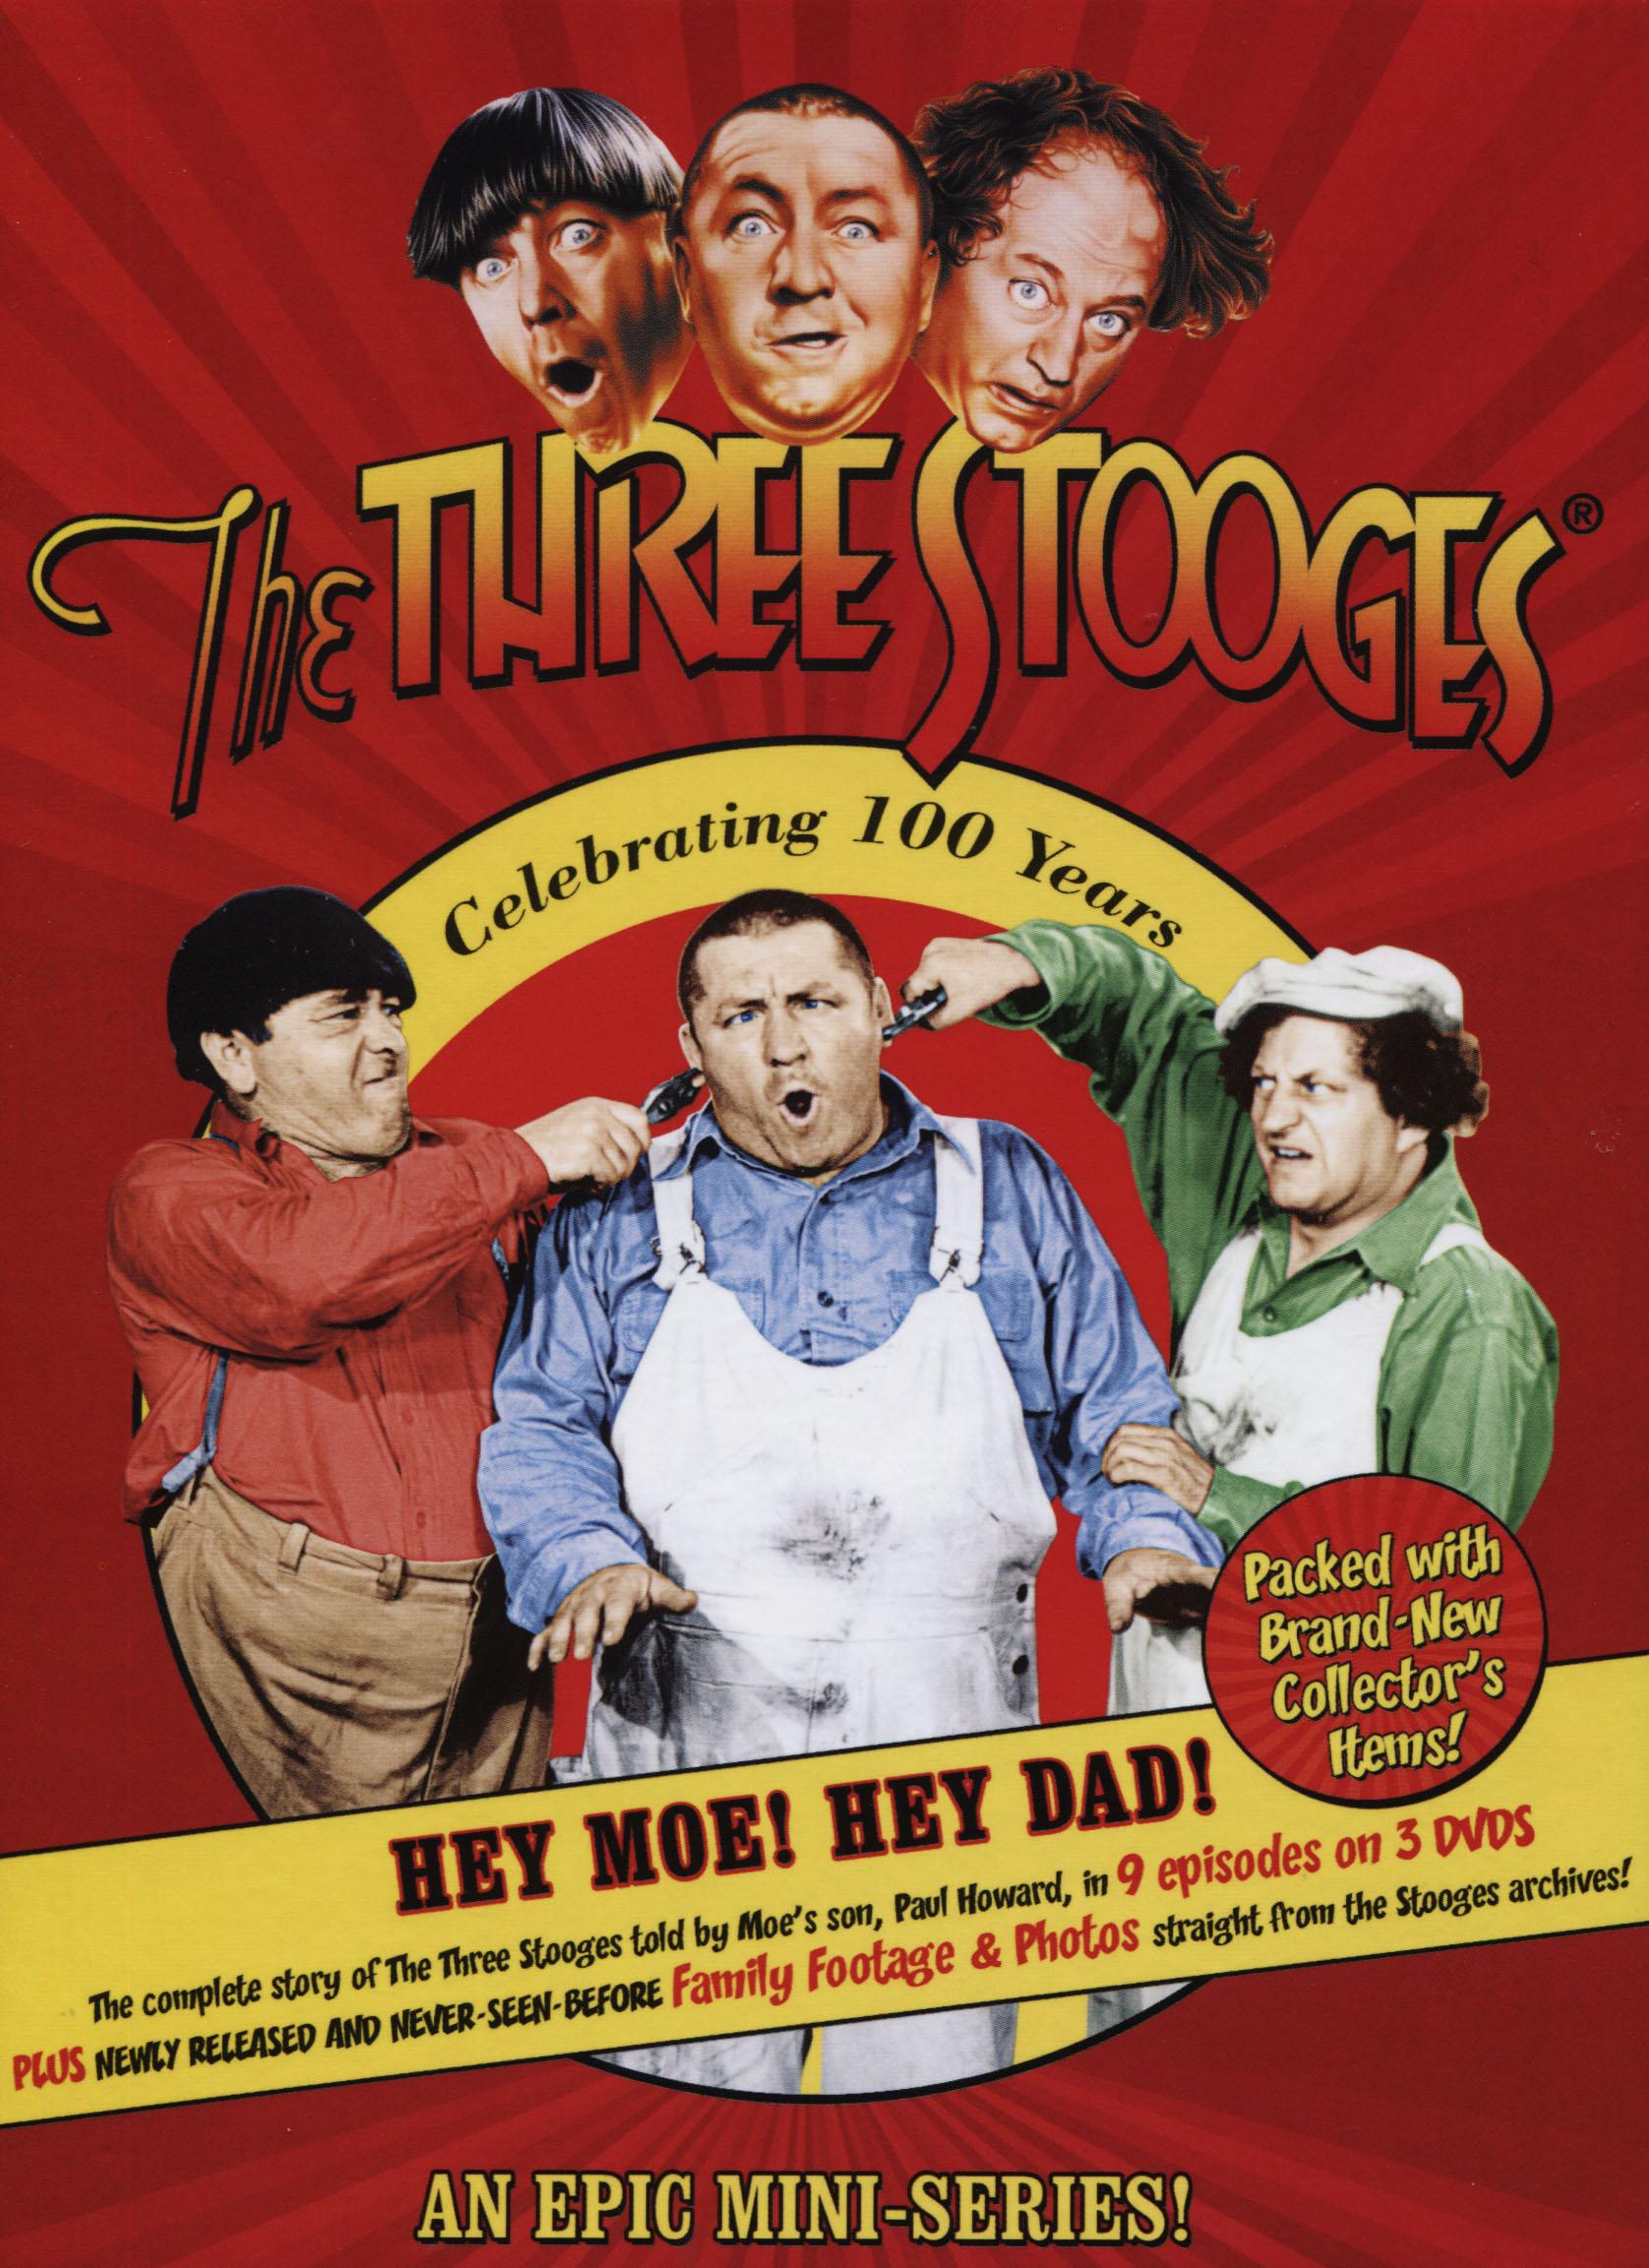 The Three Stooges: Hey Moe! Hey Dad!